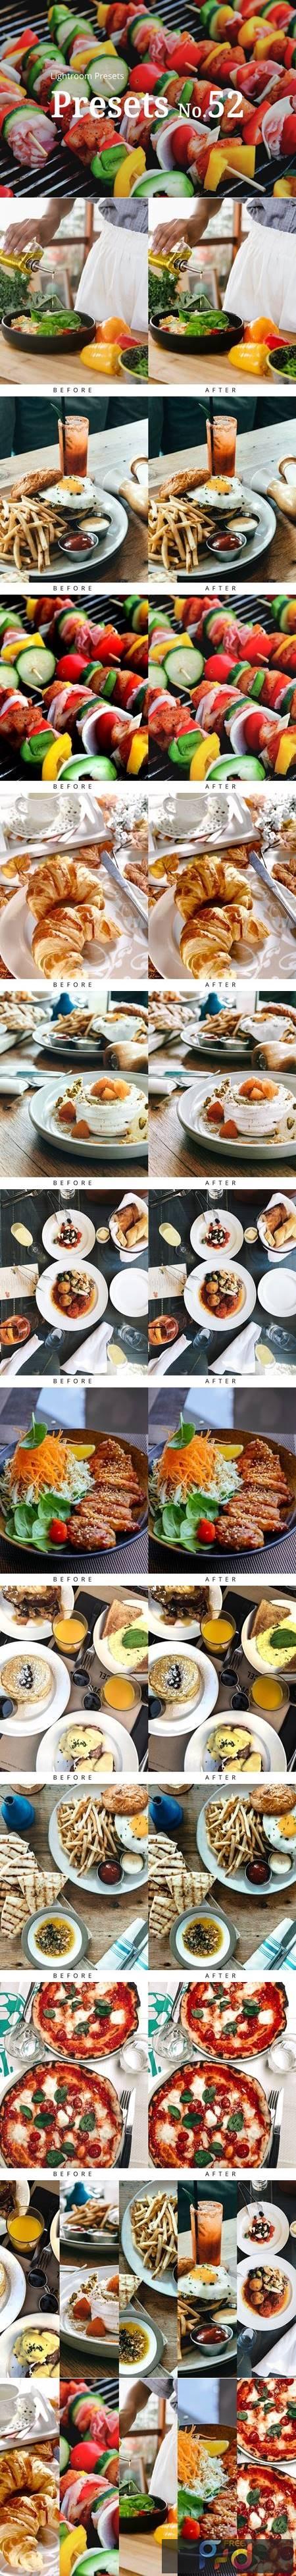 10 Food Lightroom Presets 5352798 1